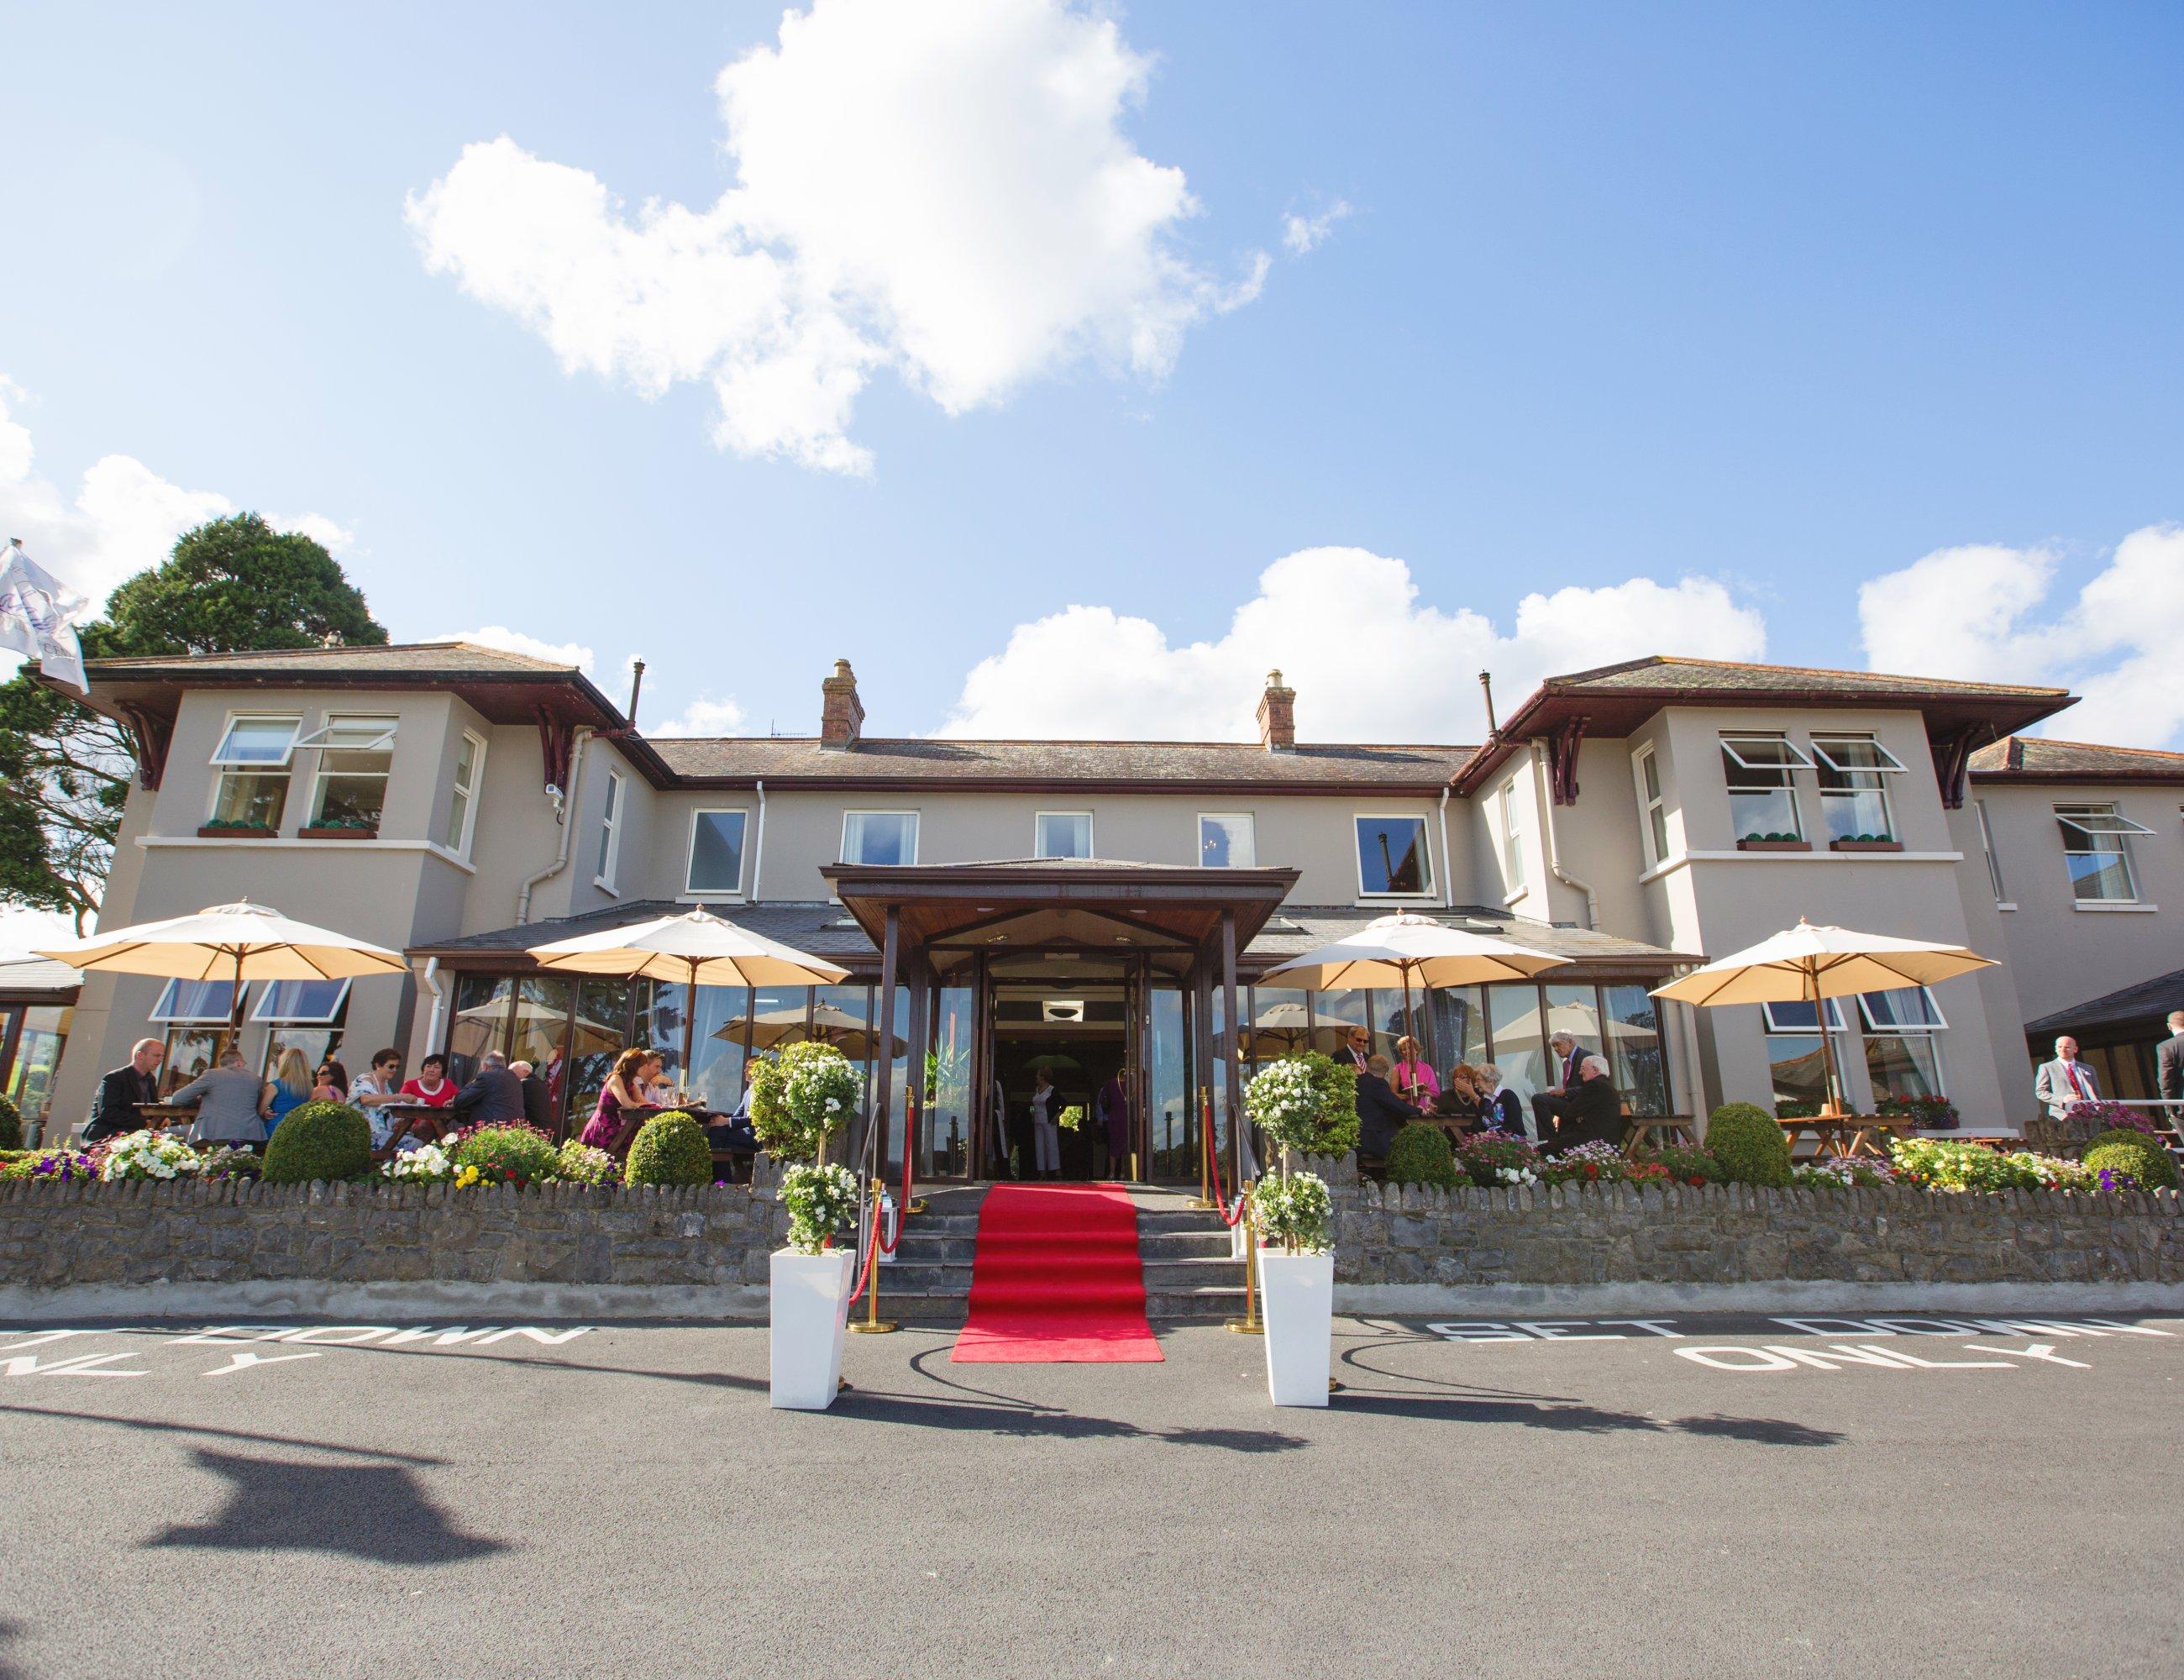 Lakeside Hotel - Killaloe, Clare